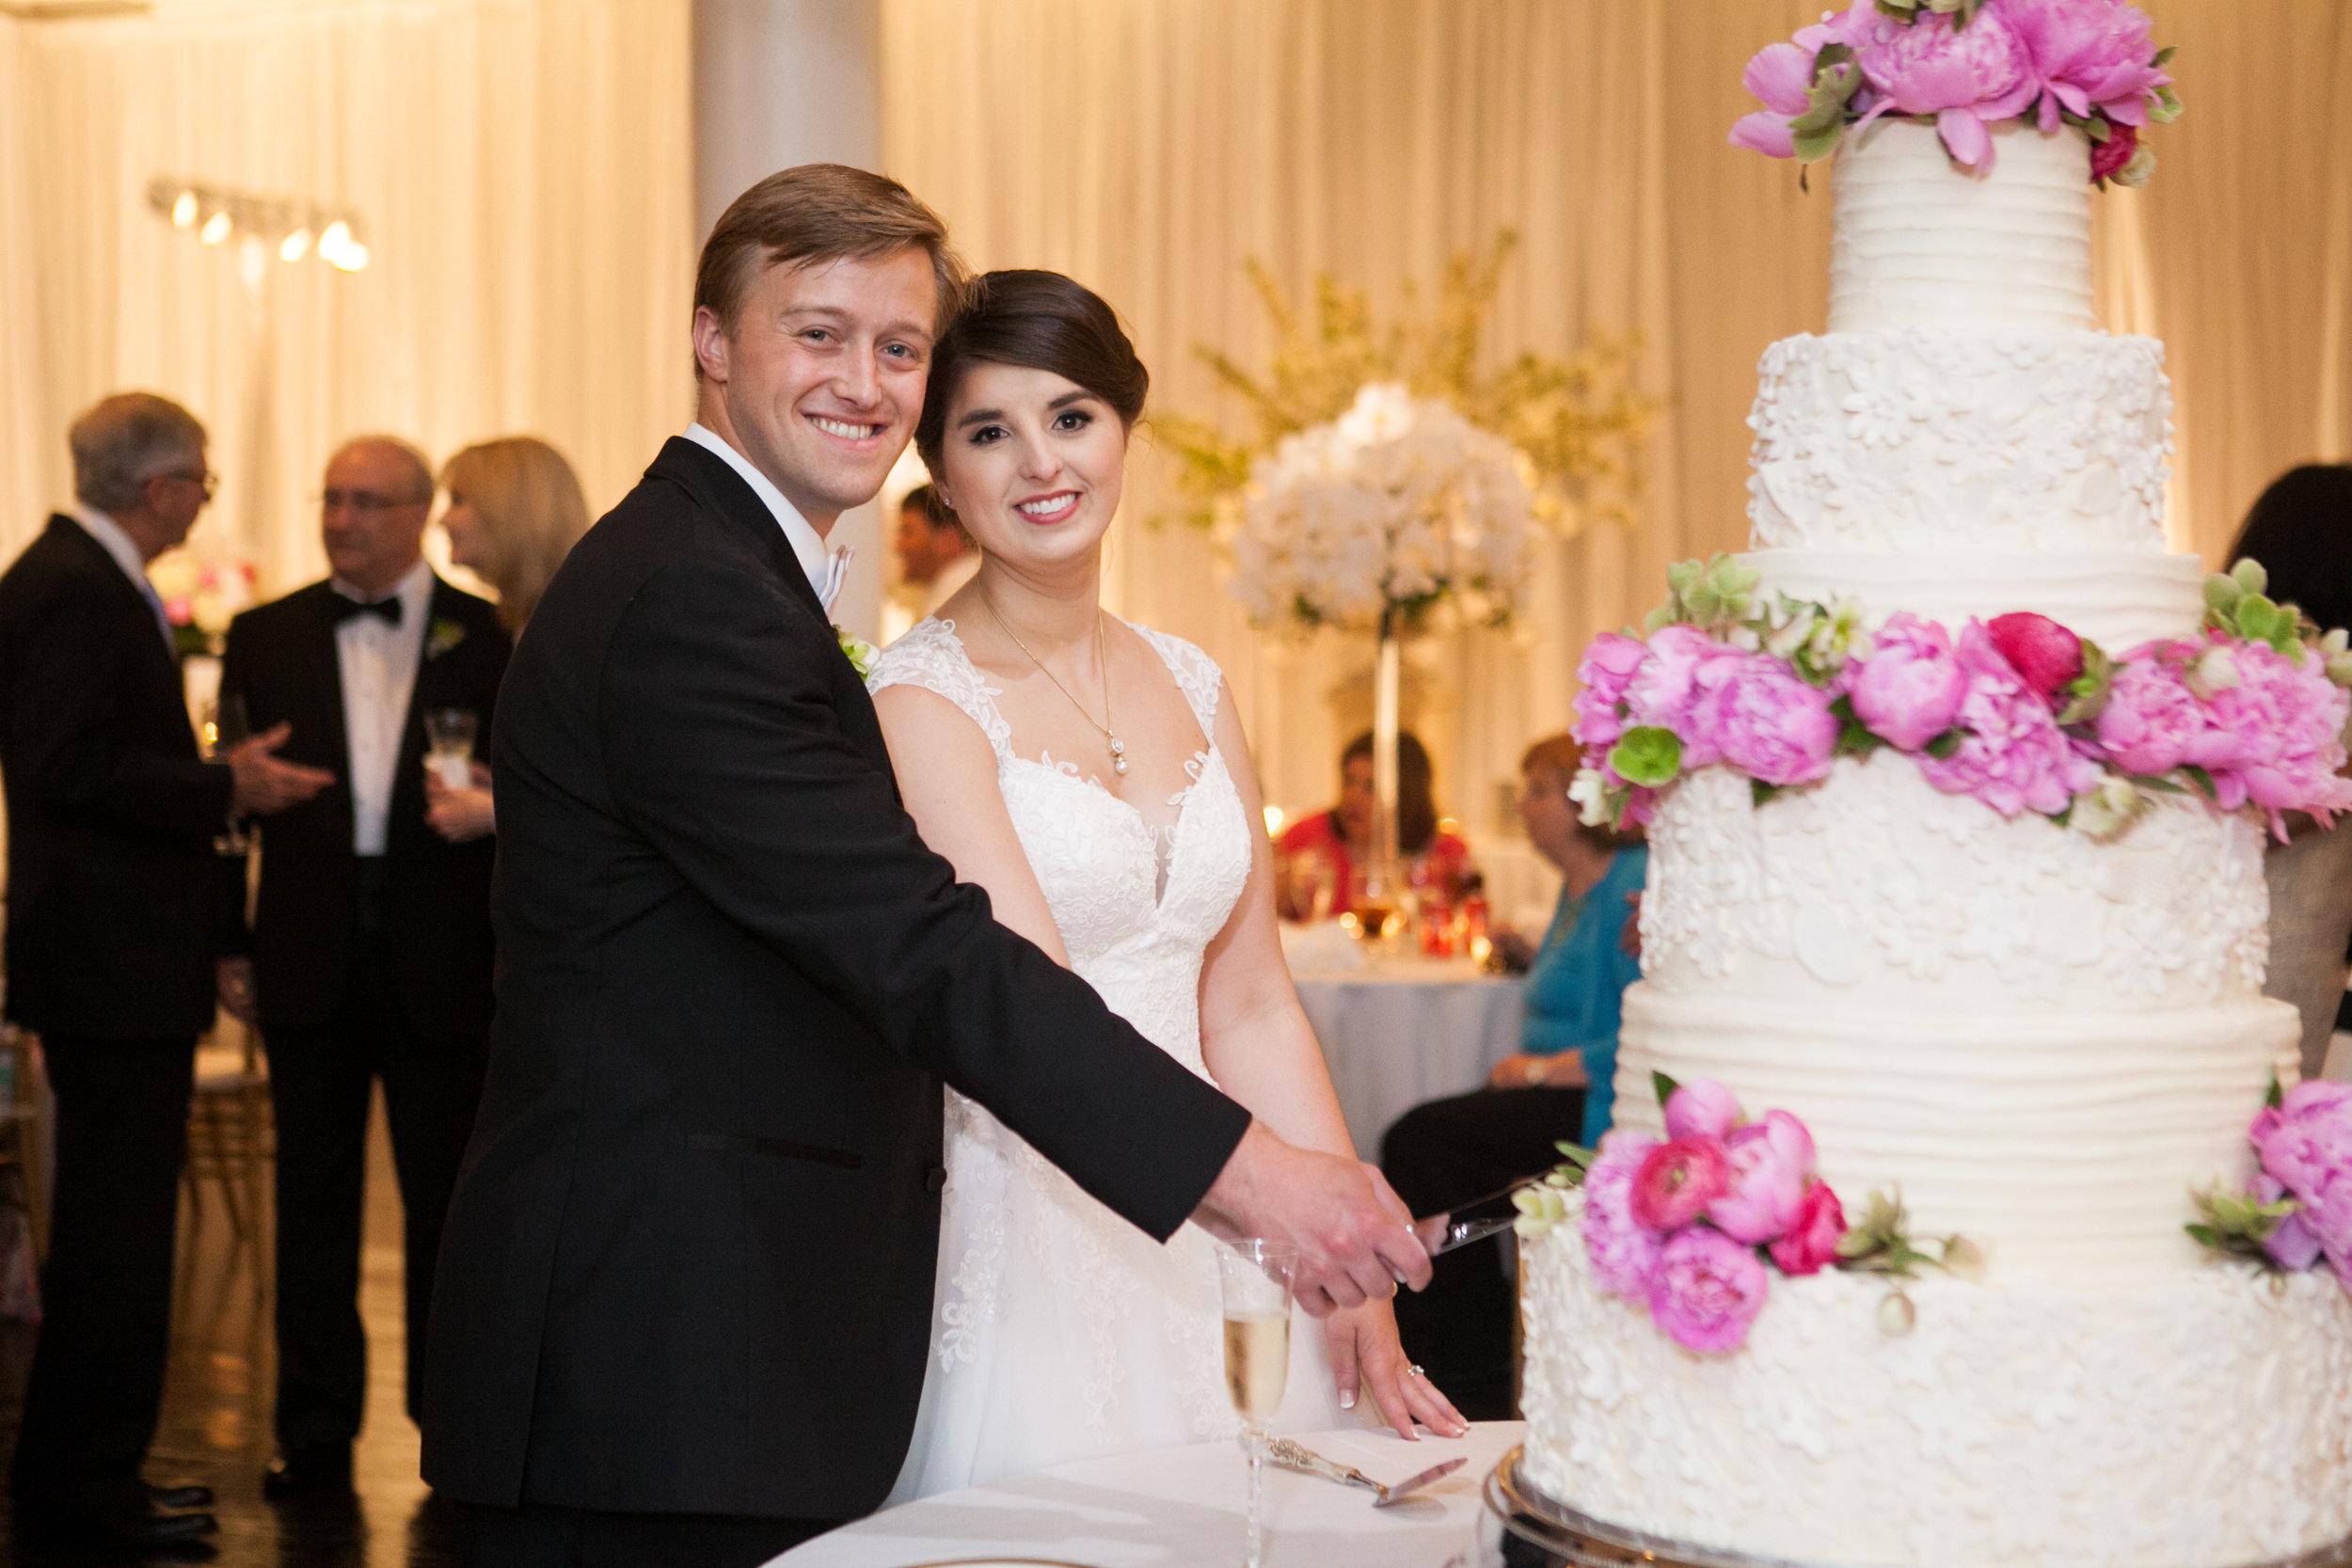 cake-cutting-wedding-reception-greg-boulus-events-augusta-georgia